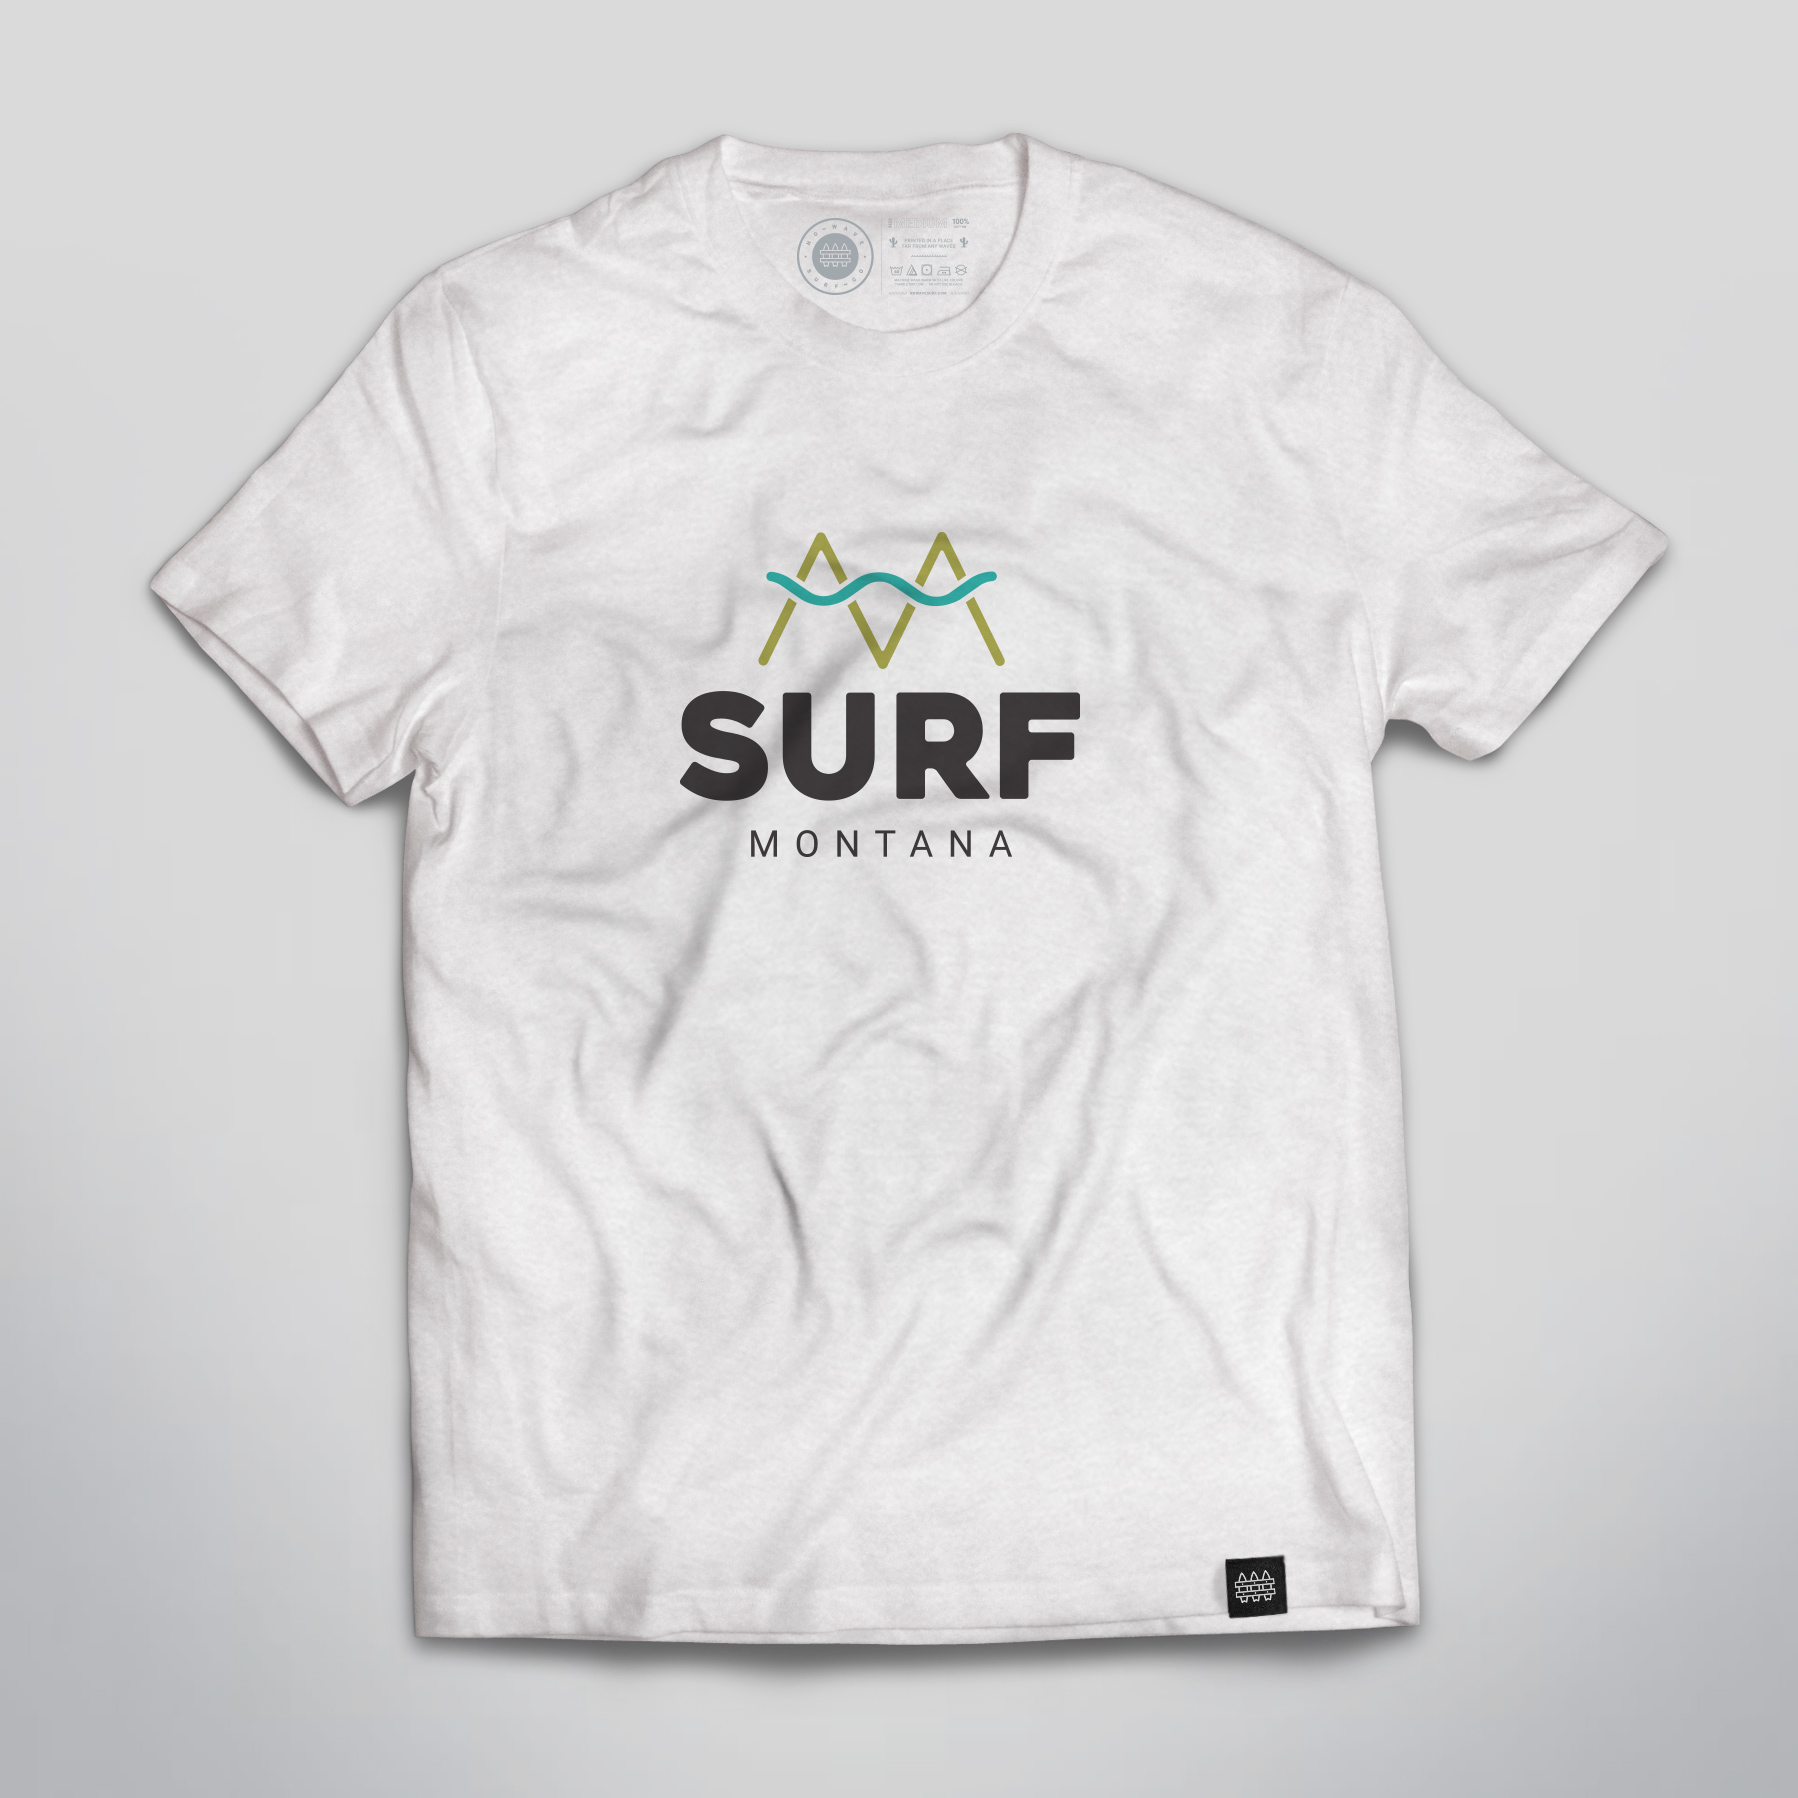 SURF_MONTANA.jpg